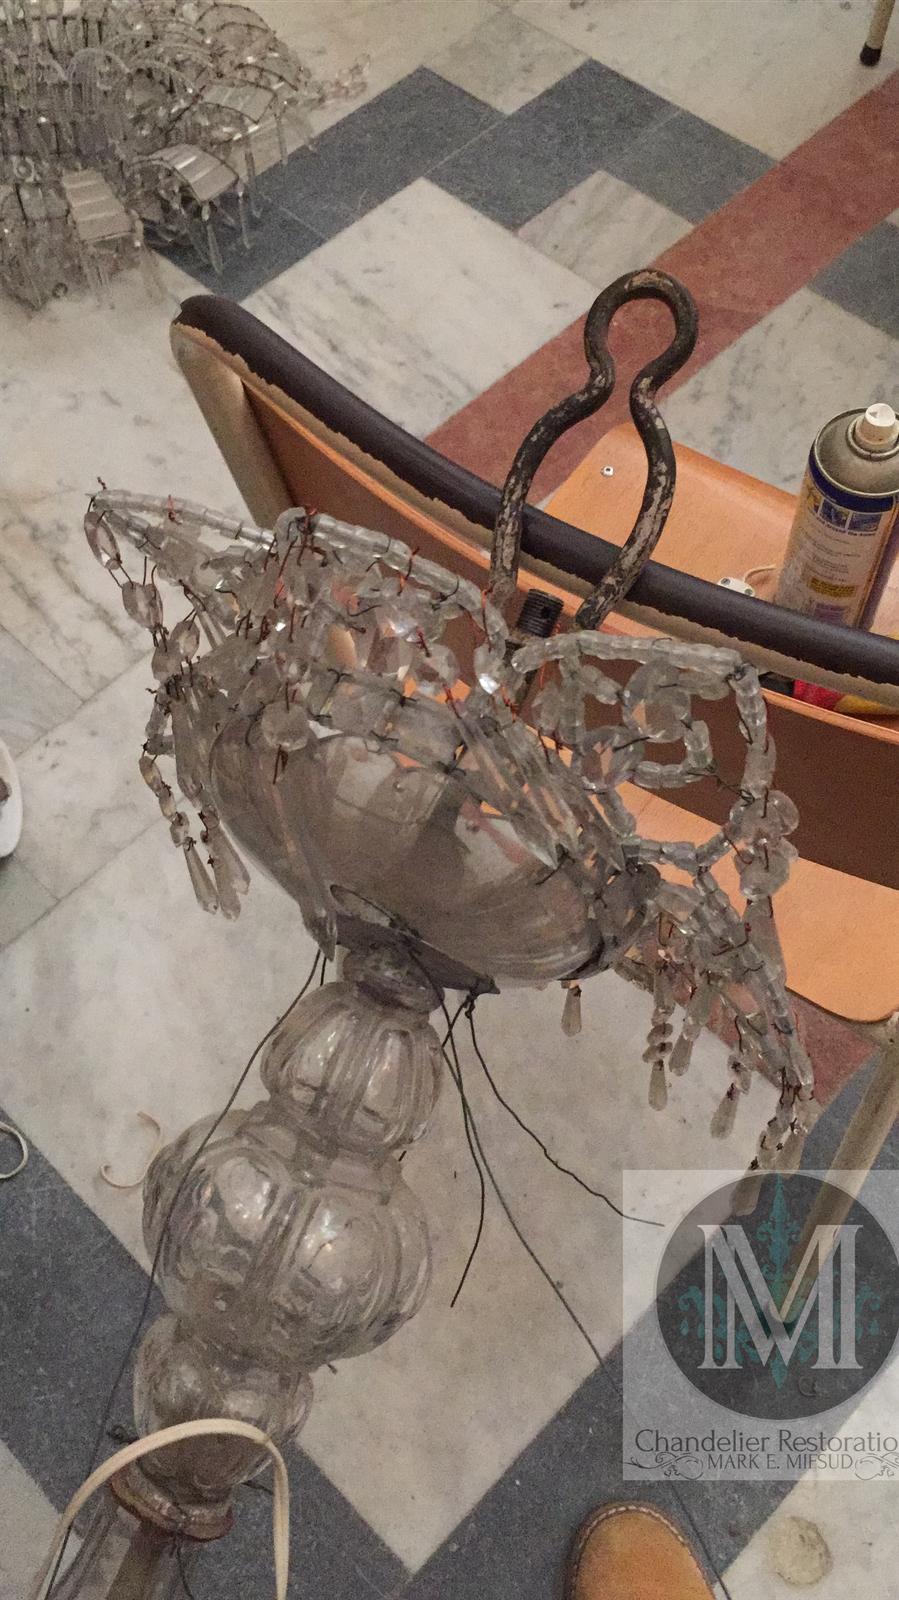 Chandeliers pre-restoration